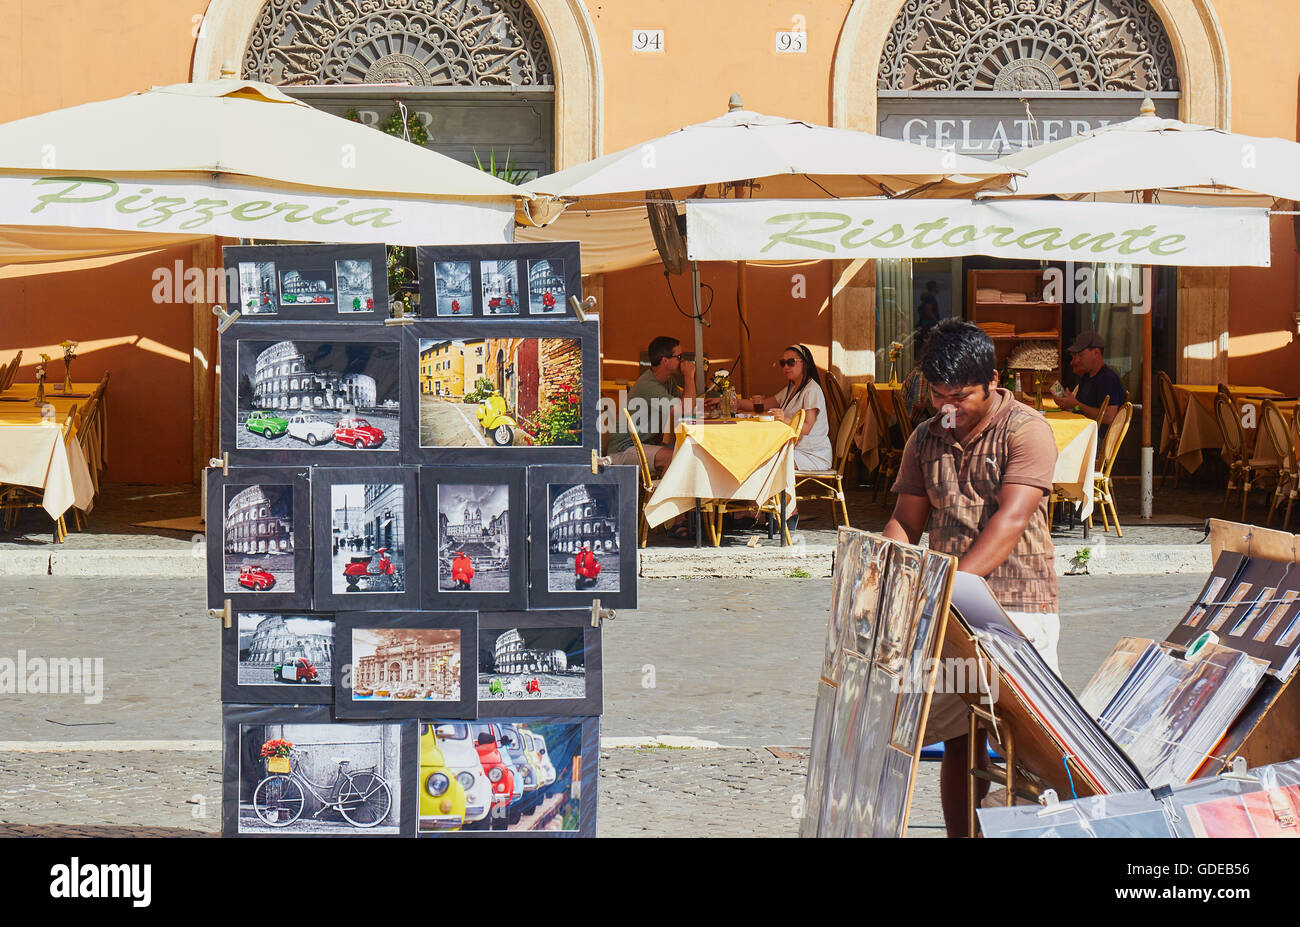 Souvenir art for sale and alfresco restaurant terrace, Piazza Navona Rome Lazio Italy Europe - Stock Image